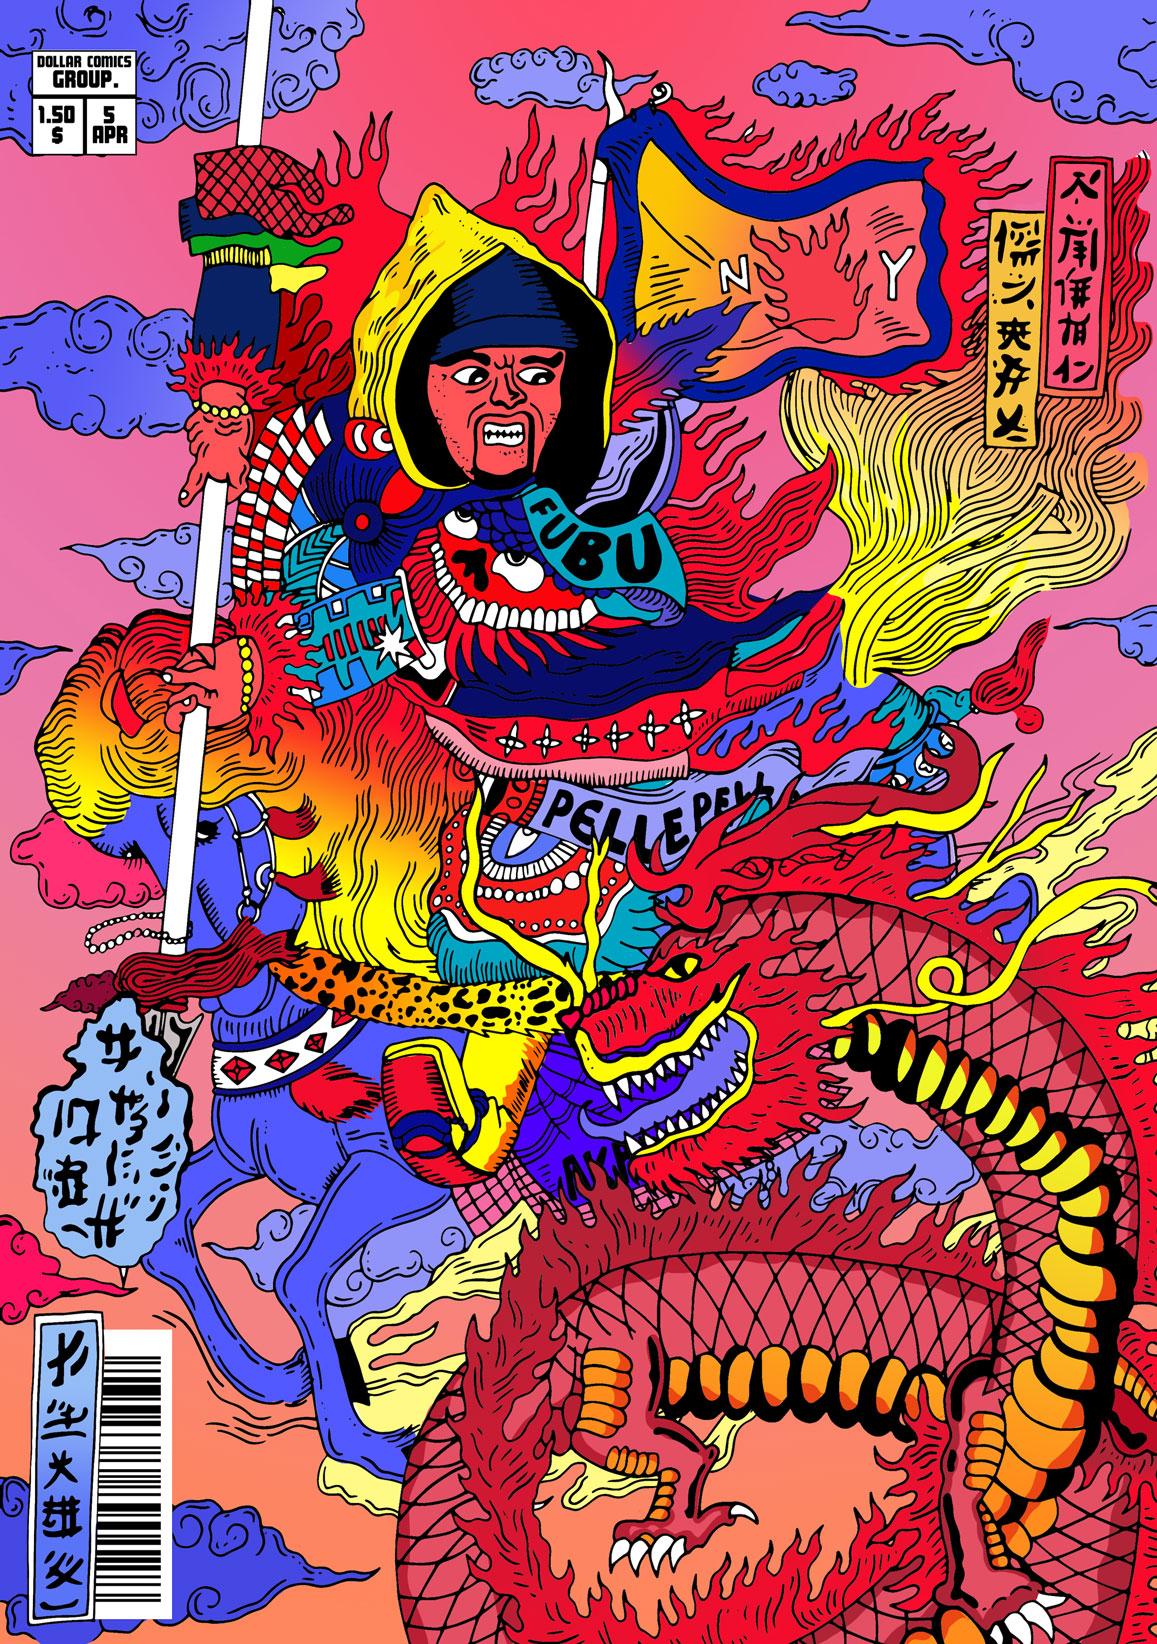 Honor-killed-the-samourai